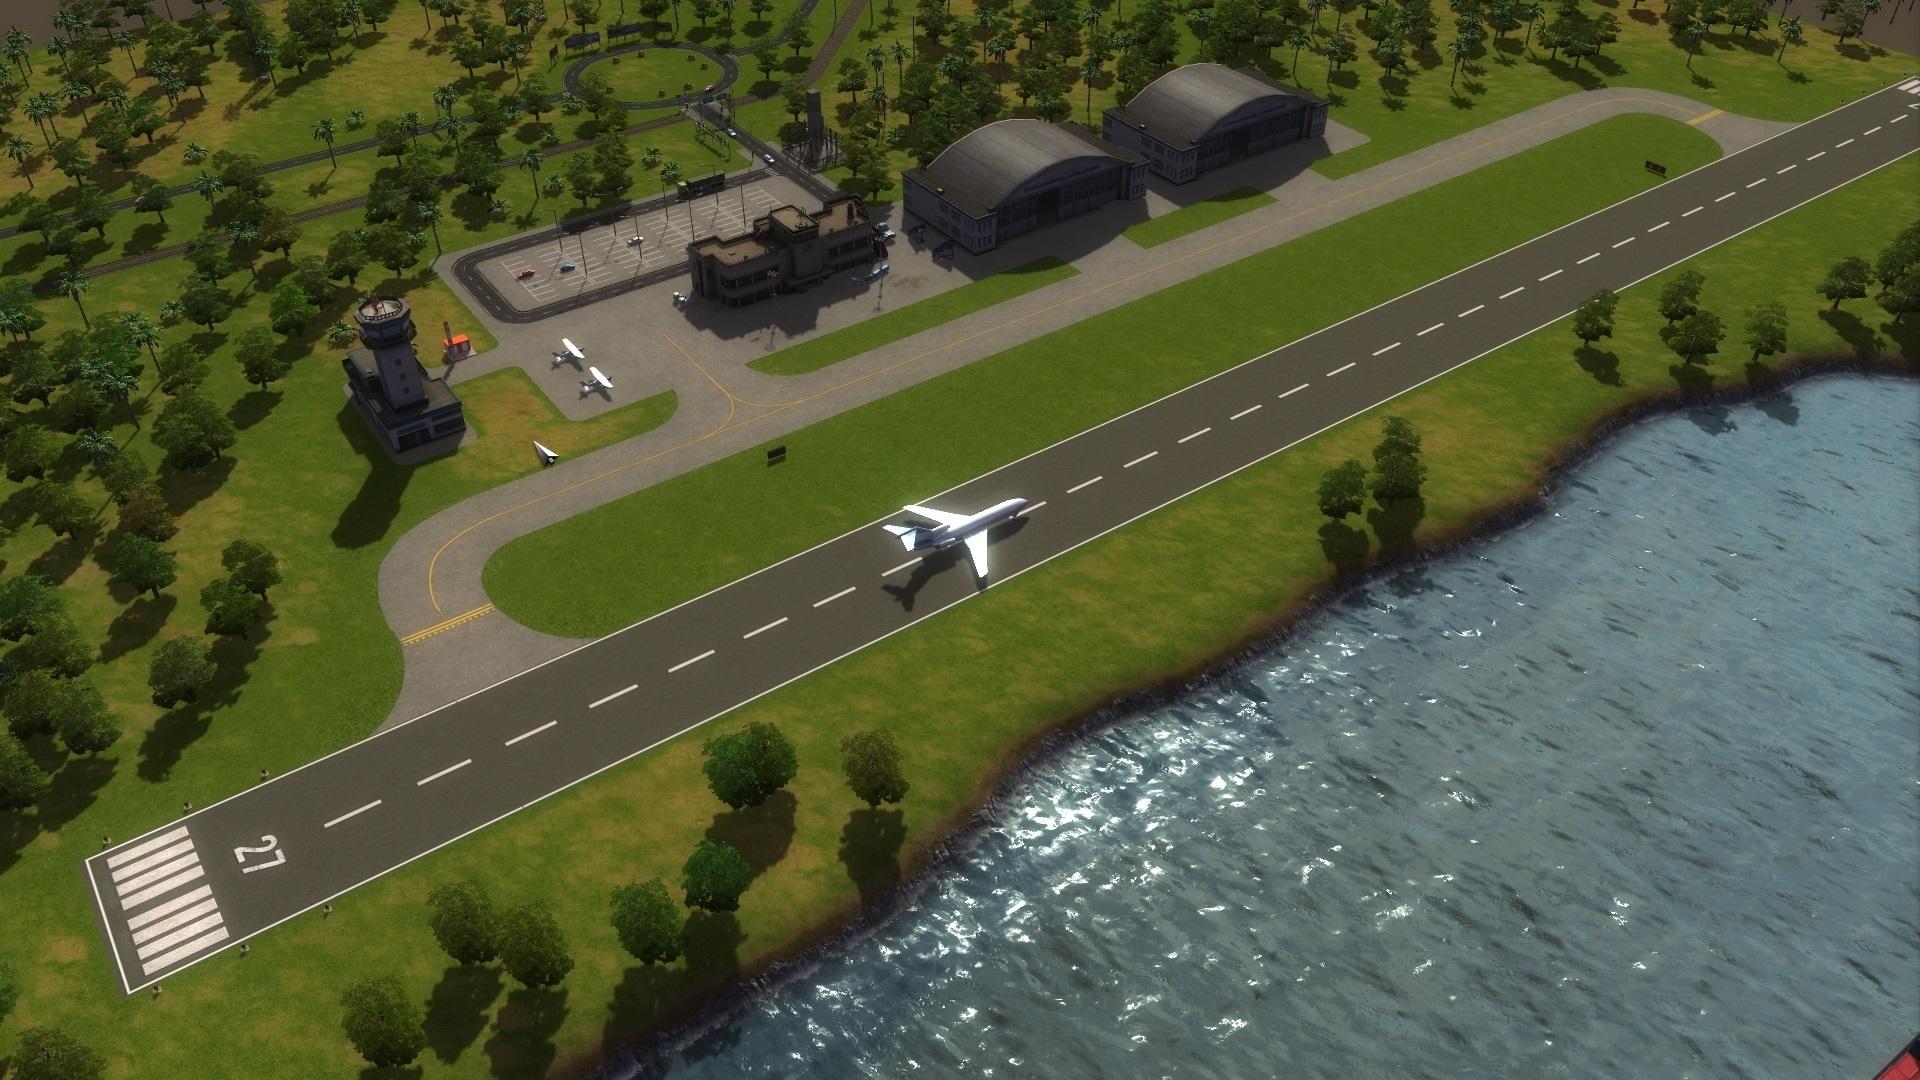 Airport.thumb.jpg.83cb2dee65555165847aa3057fe8c655.jpg